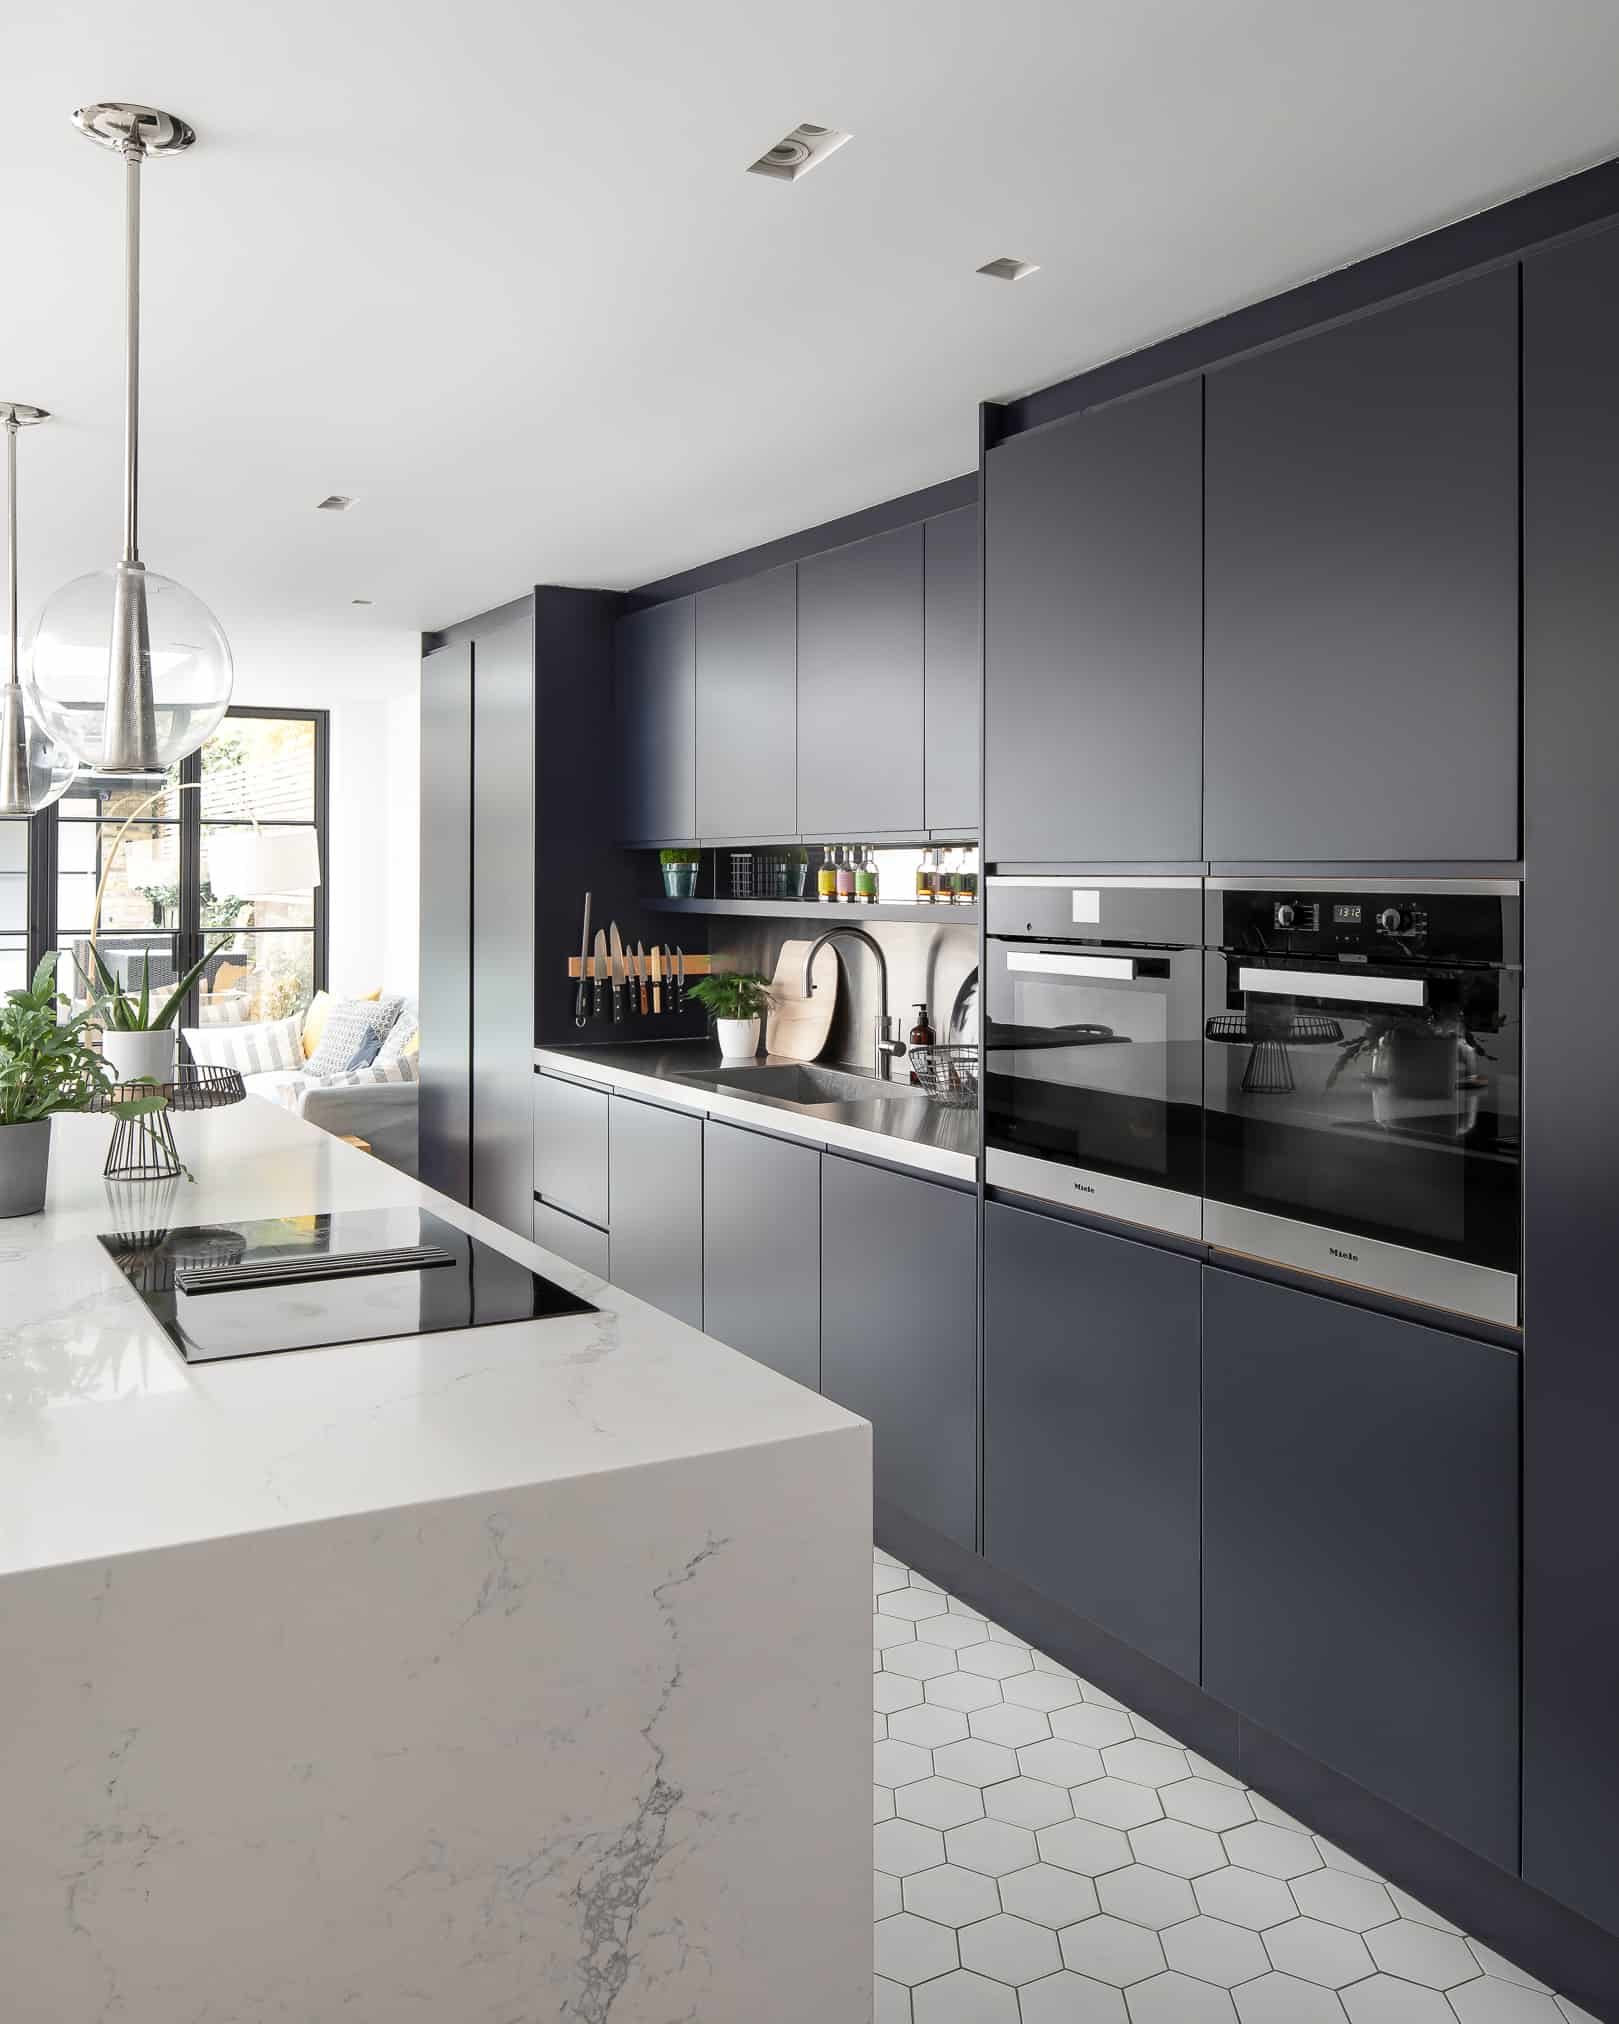 Handleless industrial style kitchen